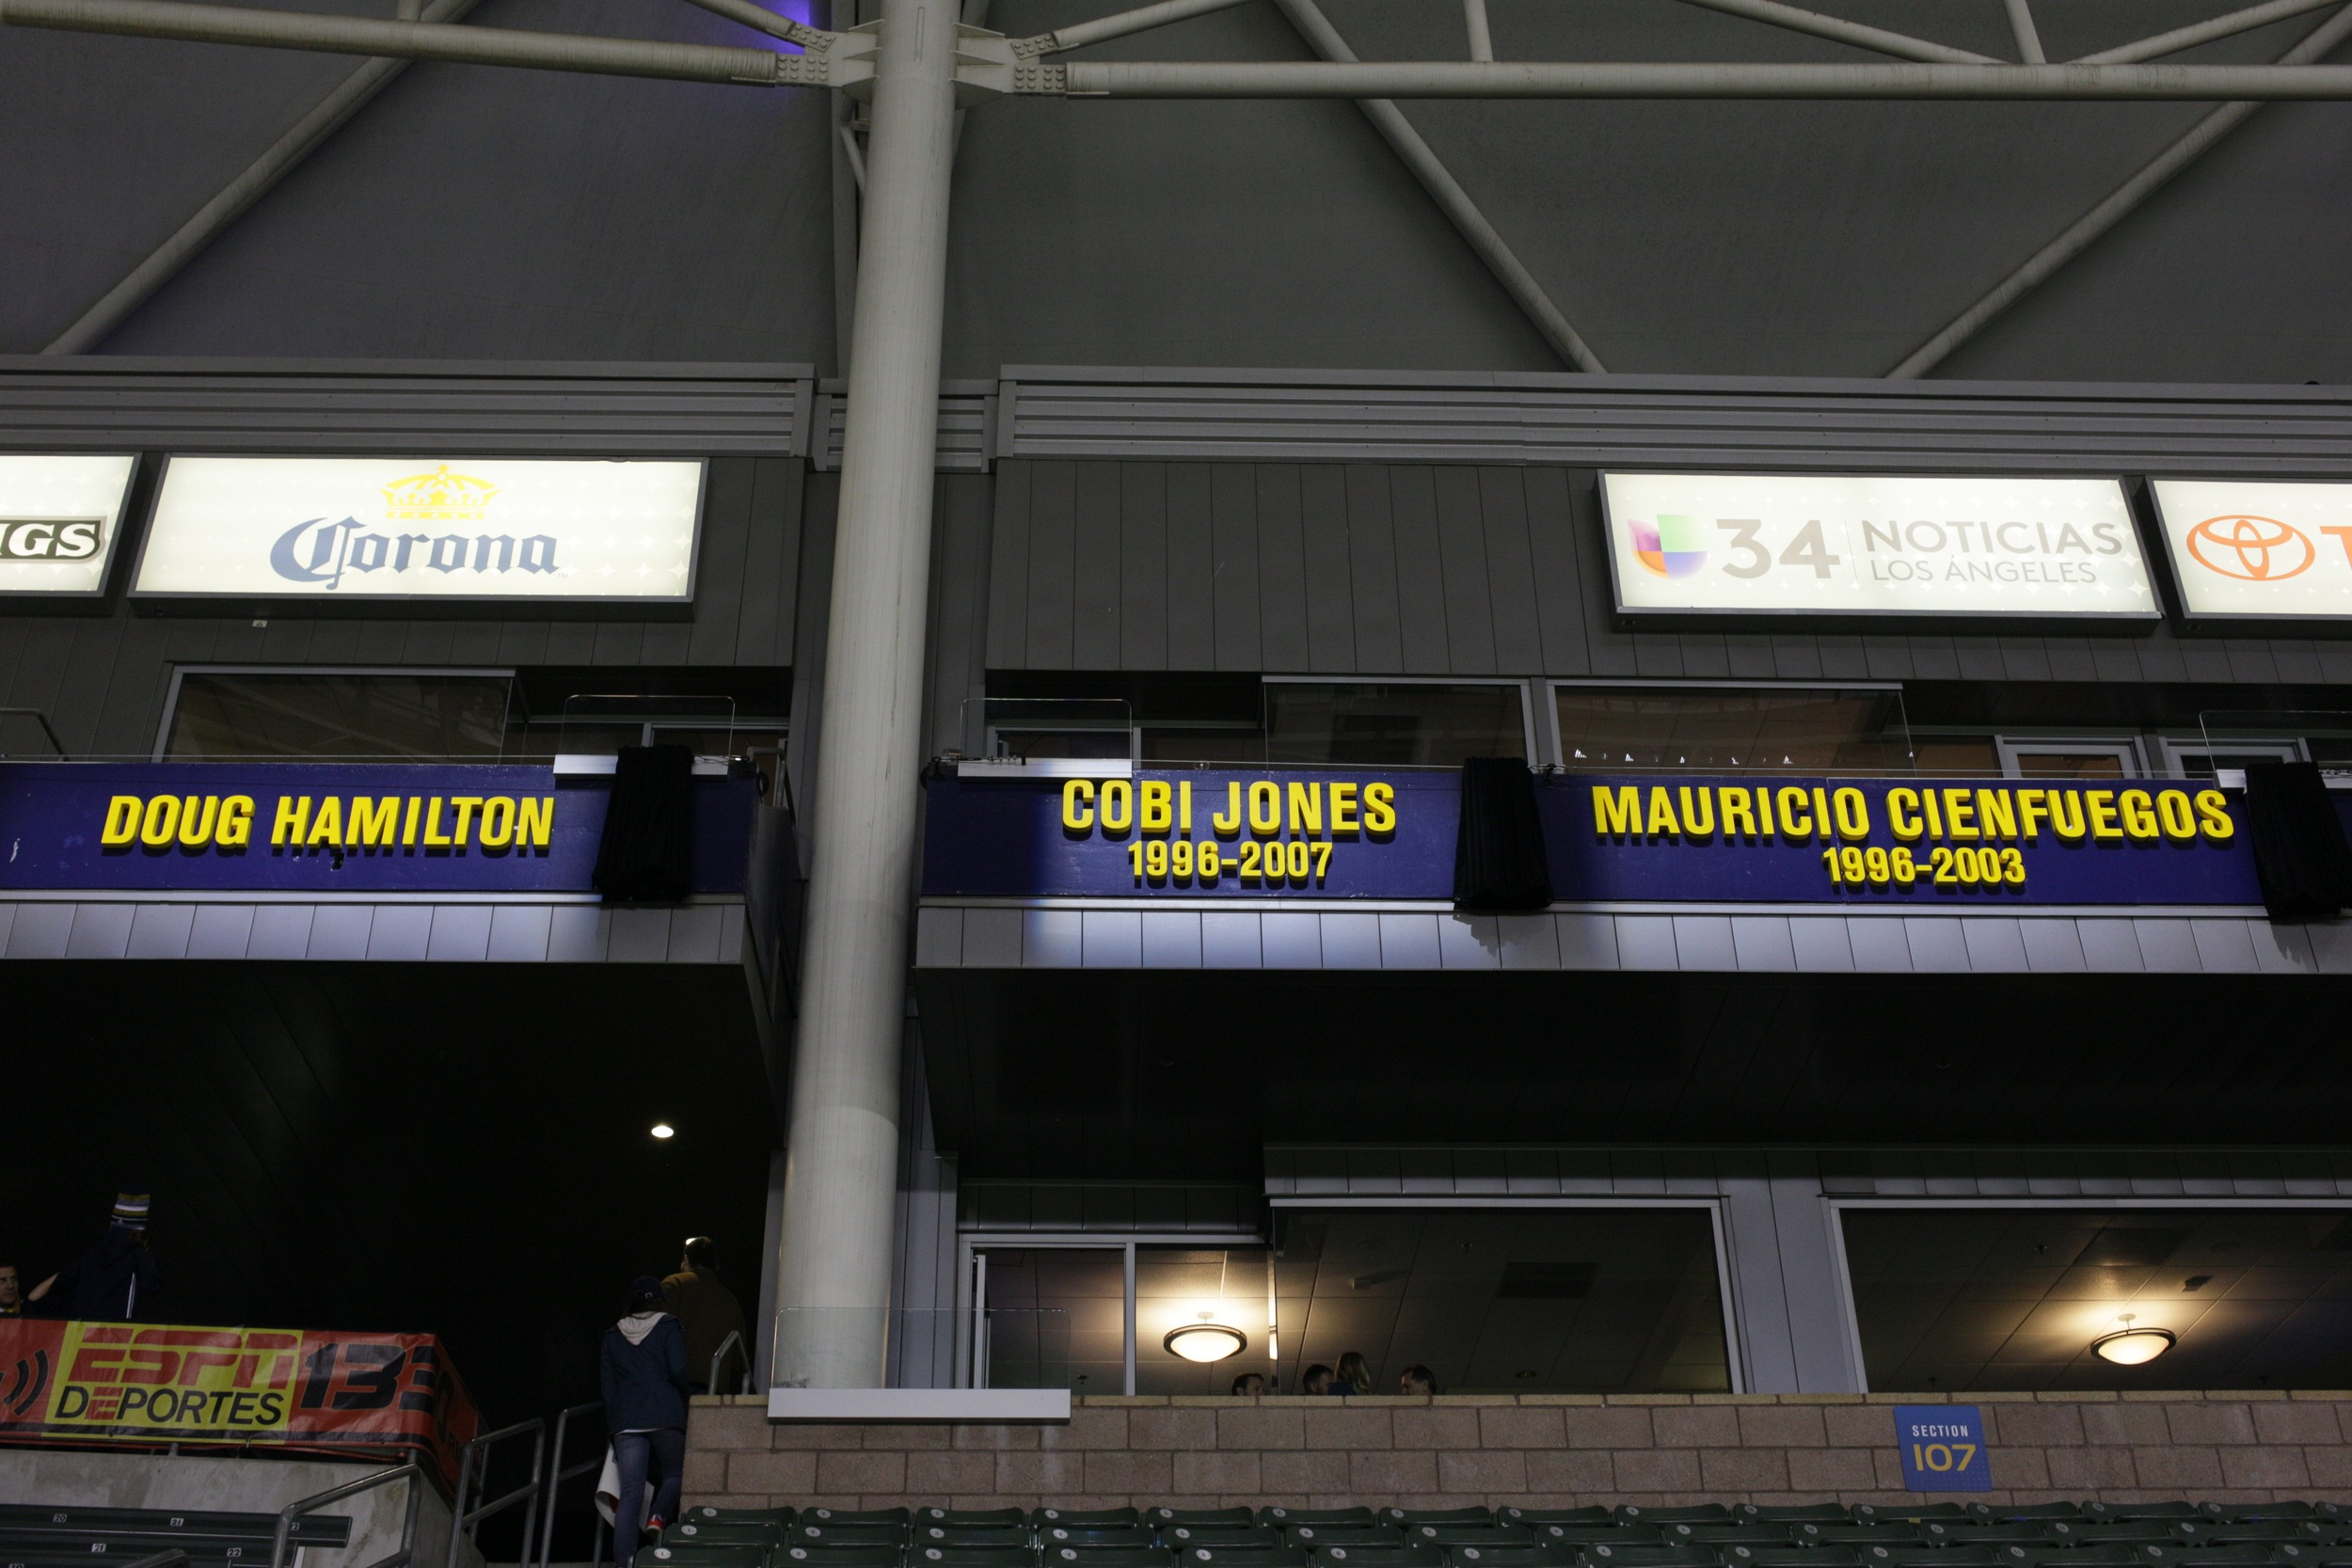 LA Galaxy honor club legends Cobi Jones, Mauricio Cienfuegos and Doug Hamilton as the inaugural Ring of Honor class.